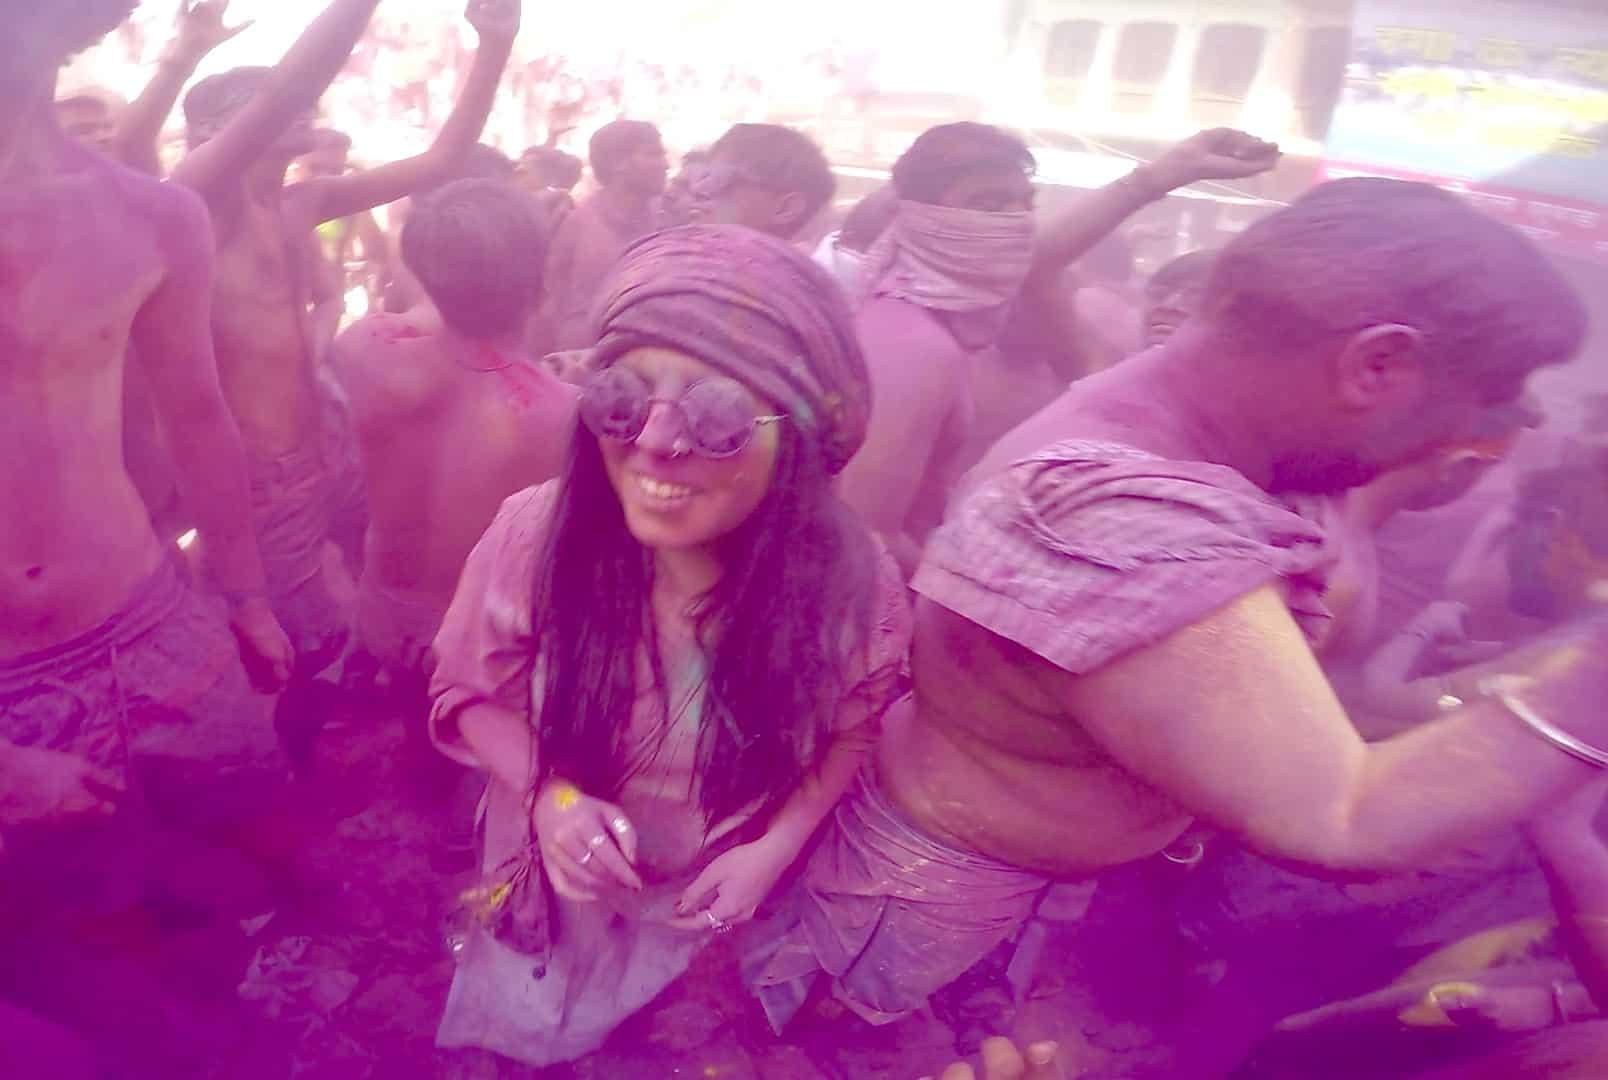 0f105ec1f7 15 HONEST FEMALE SAFETY TIPS FOR HOLI FESTIVAL IN INDIA - Third Eye ...